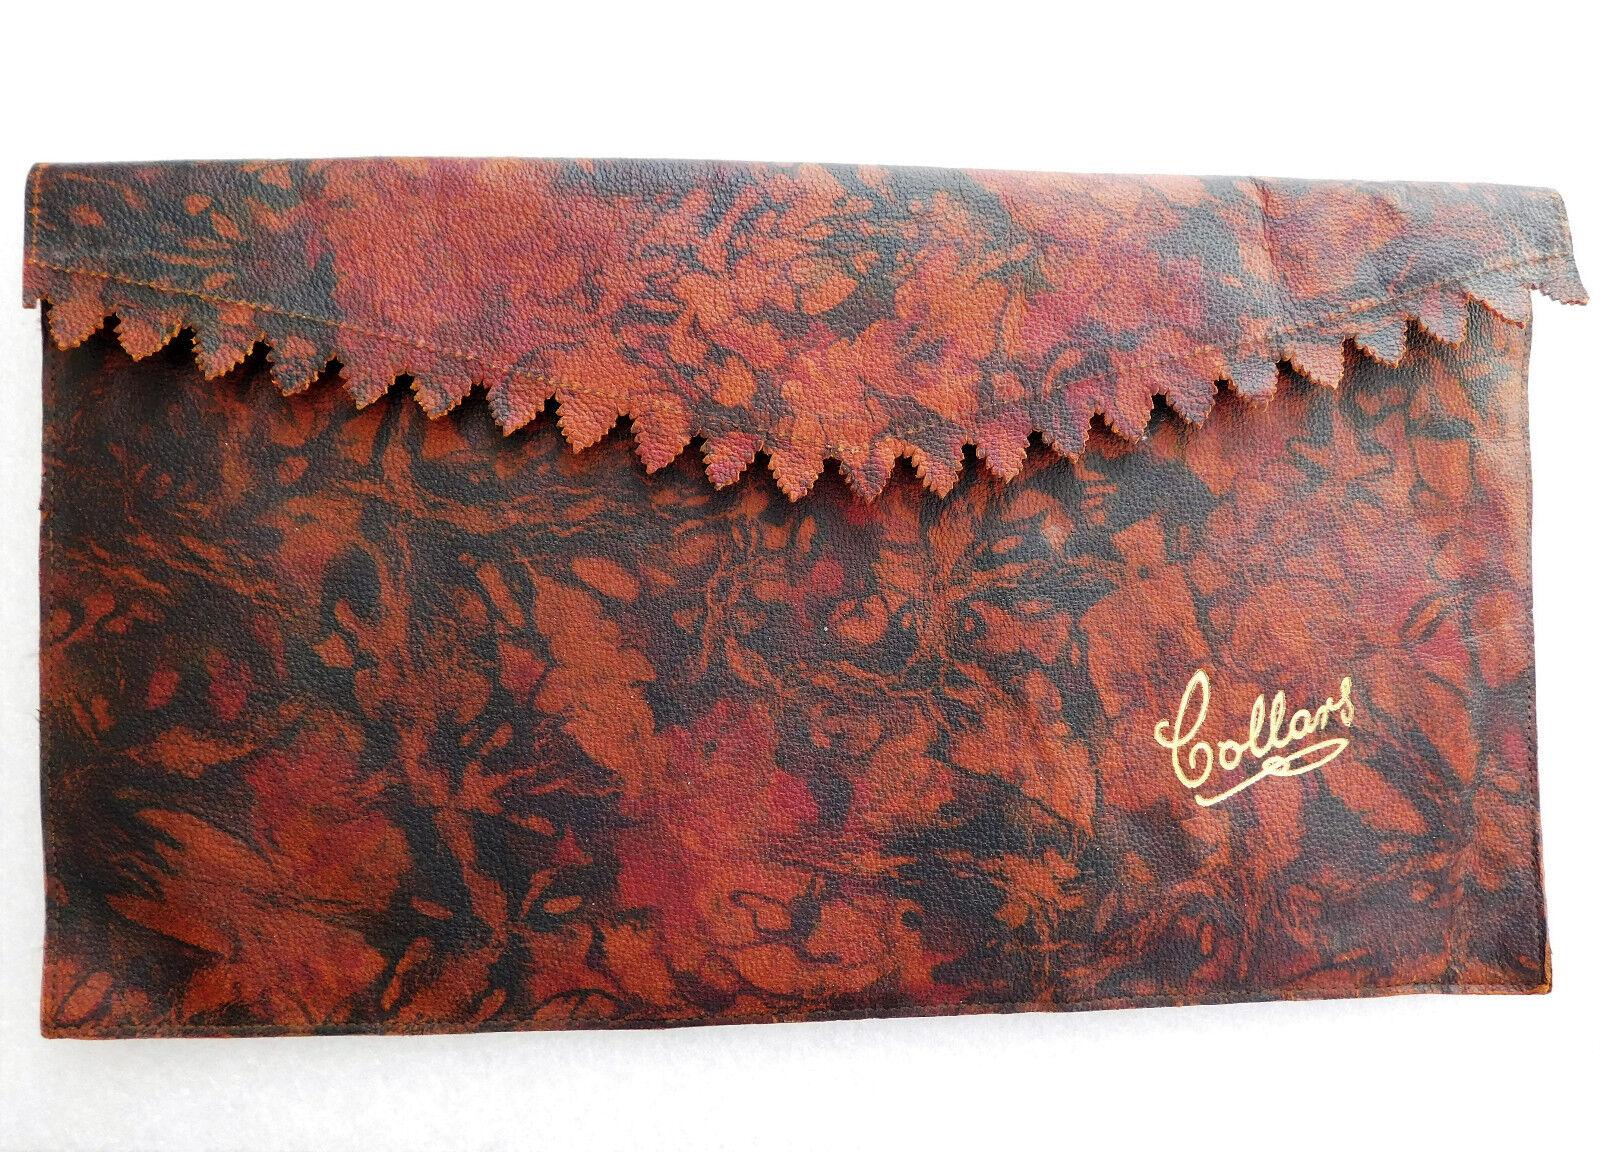 Soft collar case Art Deco 1930s wallet travel pouch Floral pattern burgundy